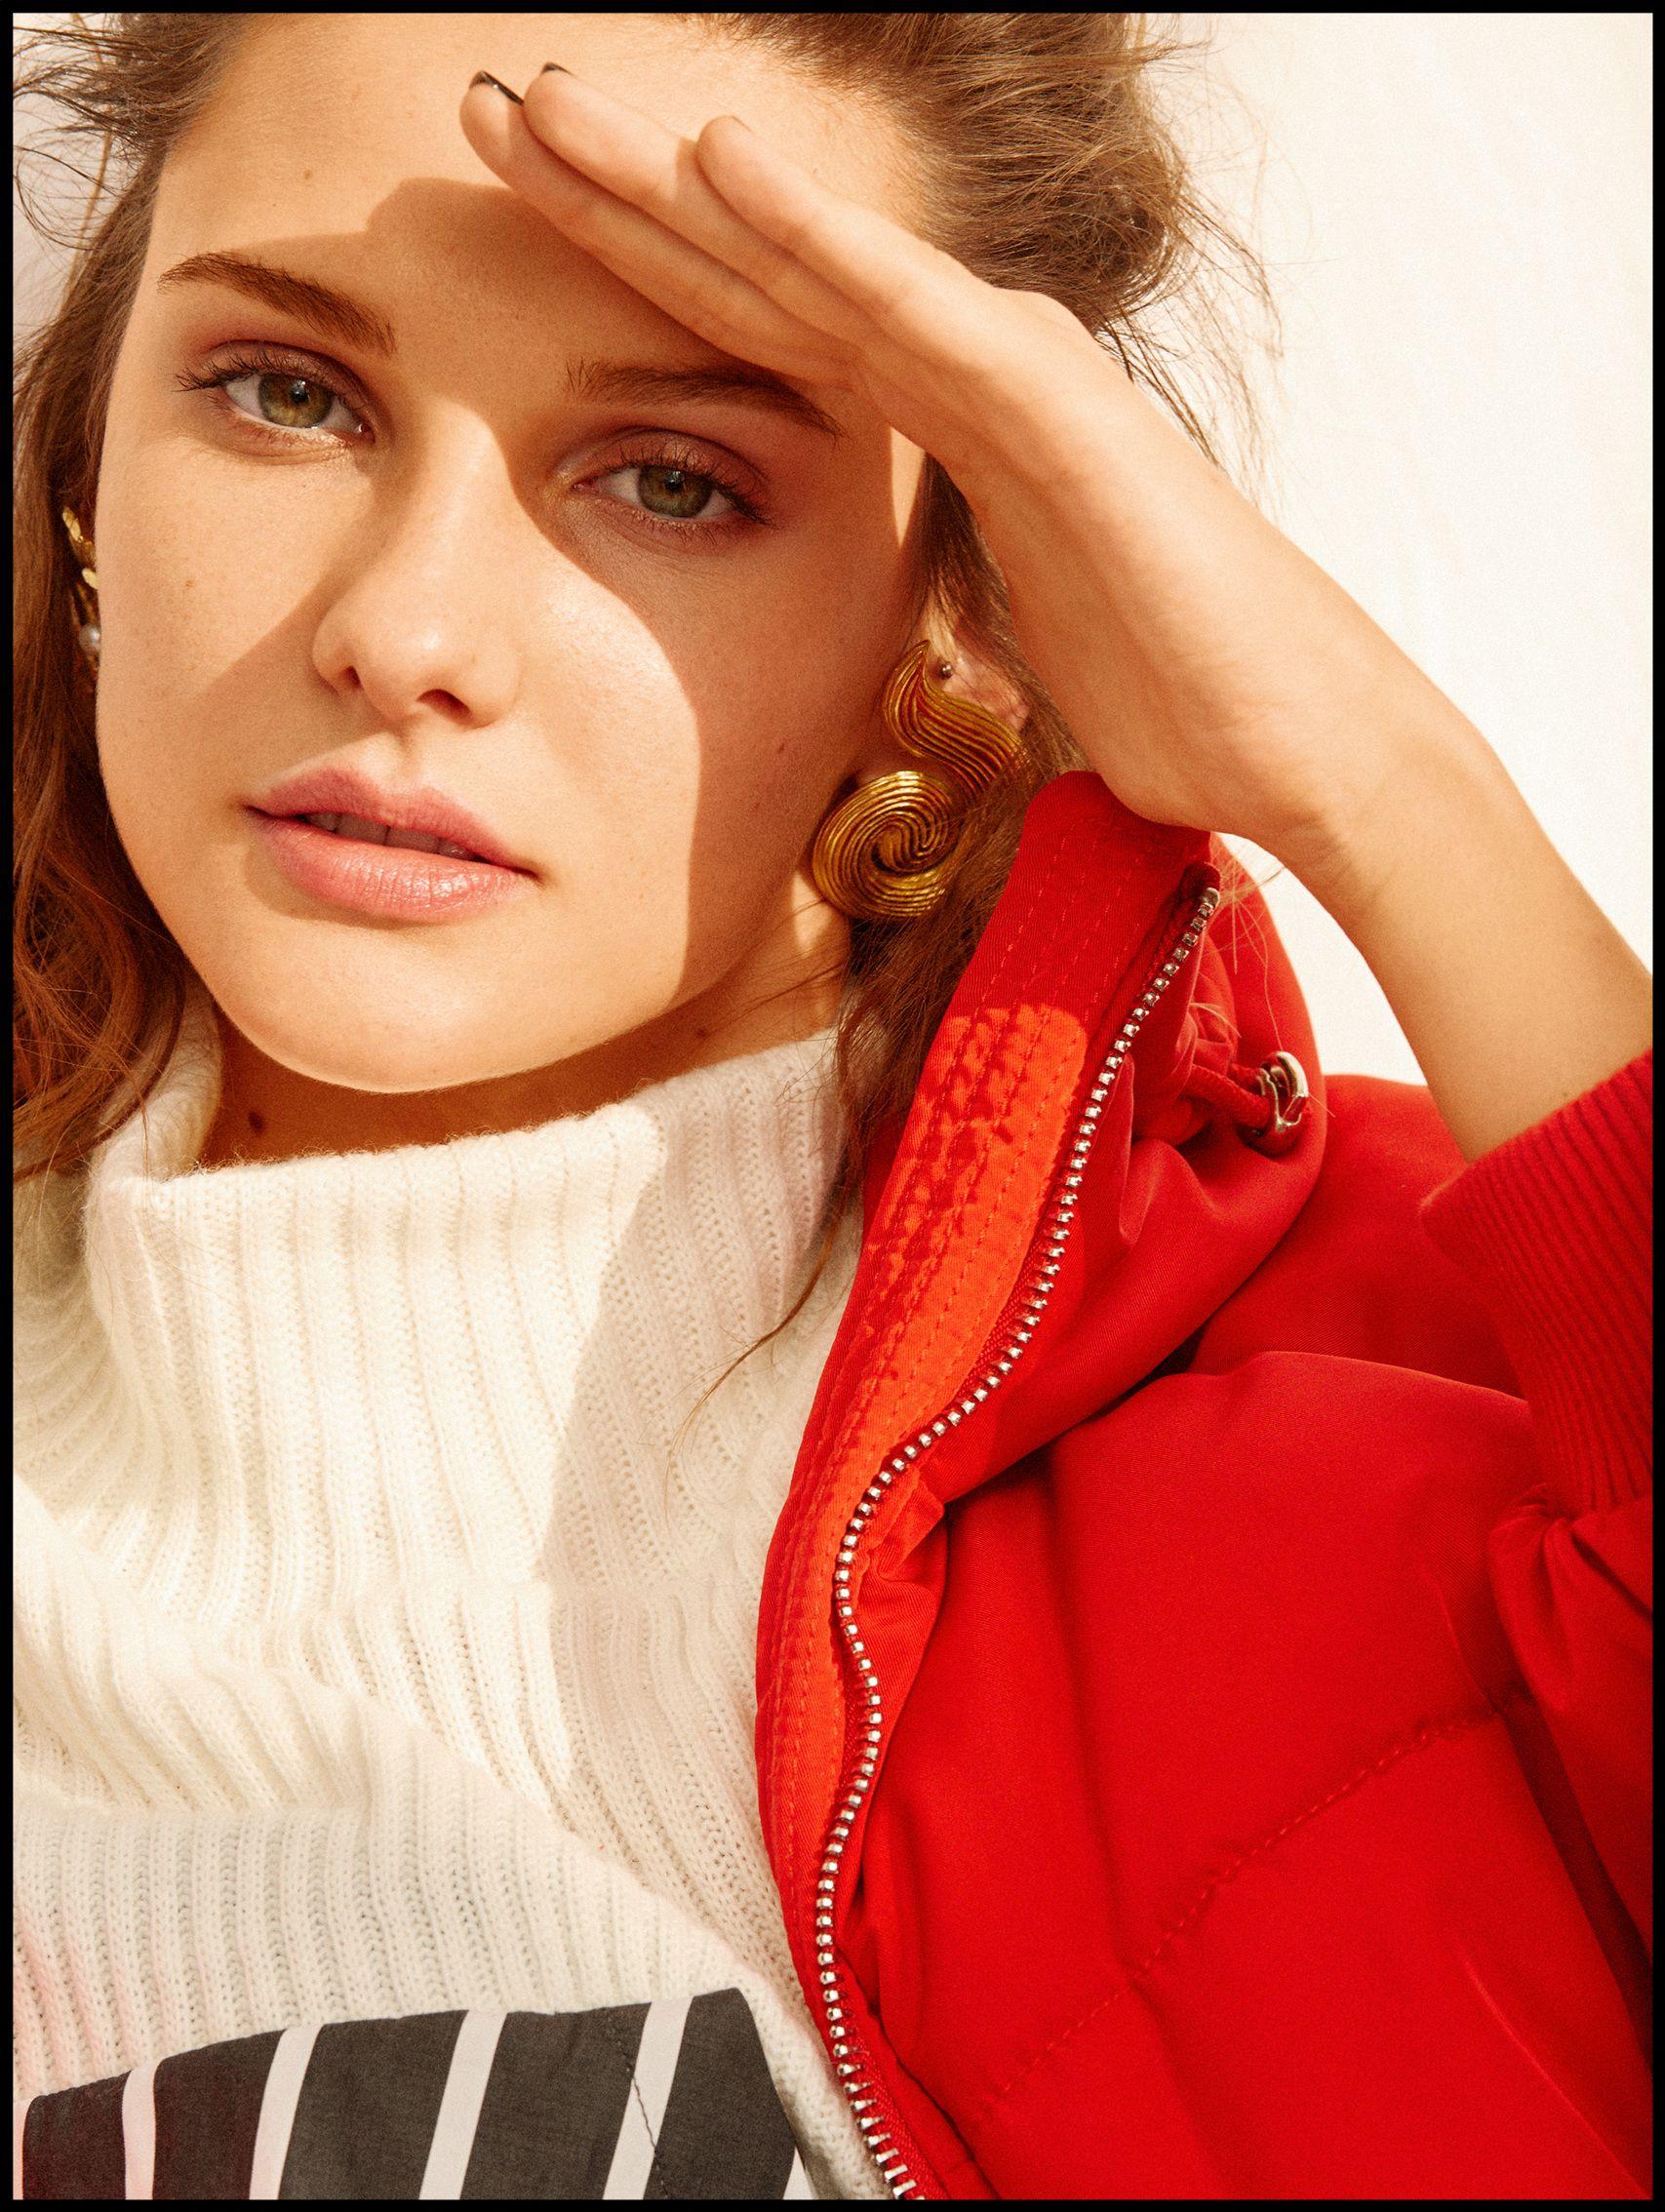 Alina Boz By Tugberk Acar For All Magazine Alina Boz Portrait Girl Turkish Women Beautiful